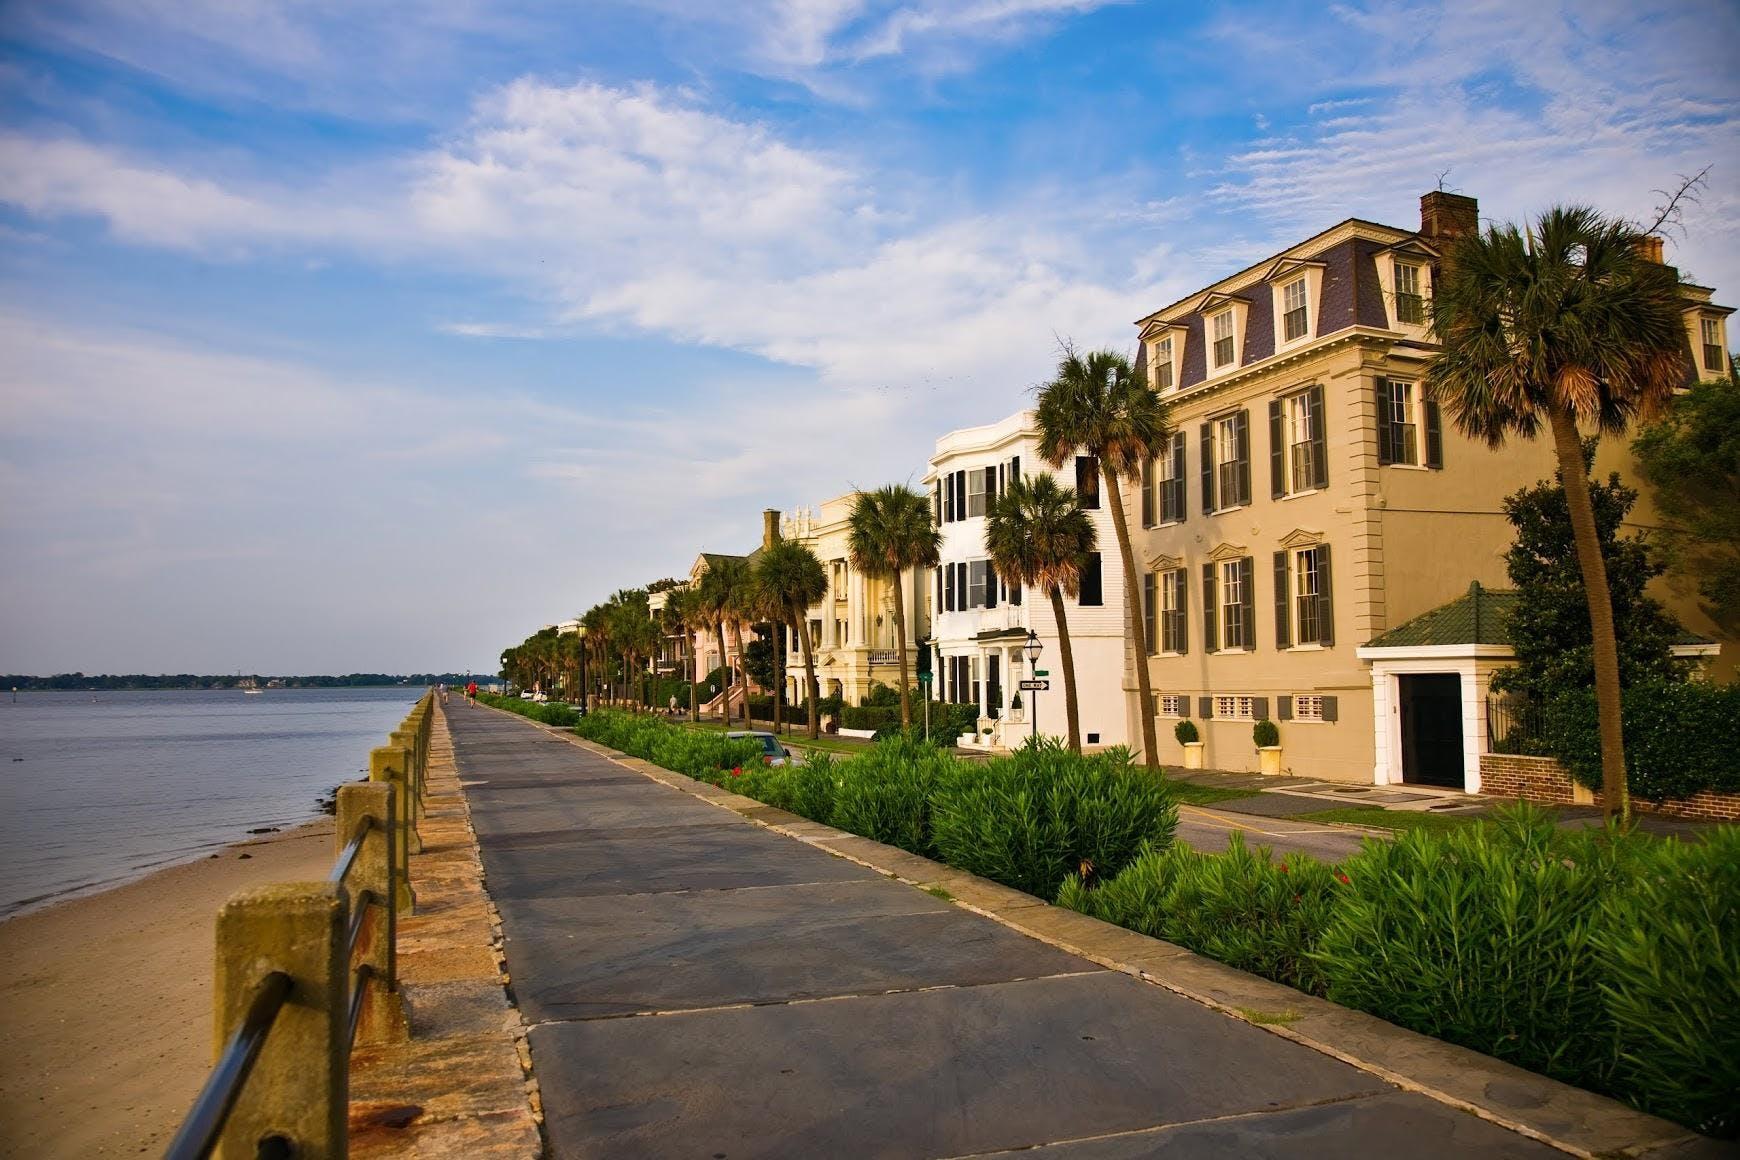 Charleston History Tour Image 1